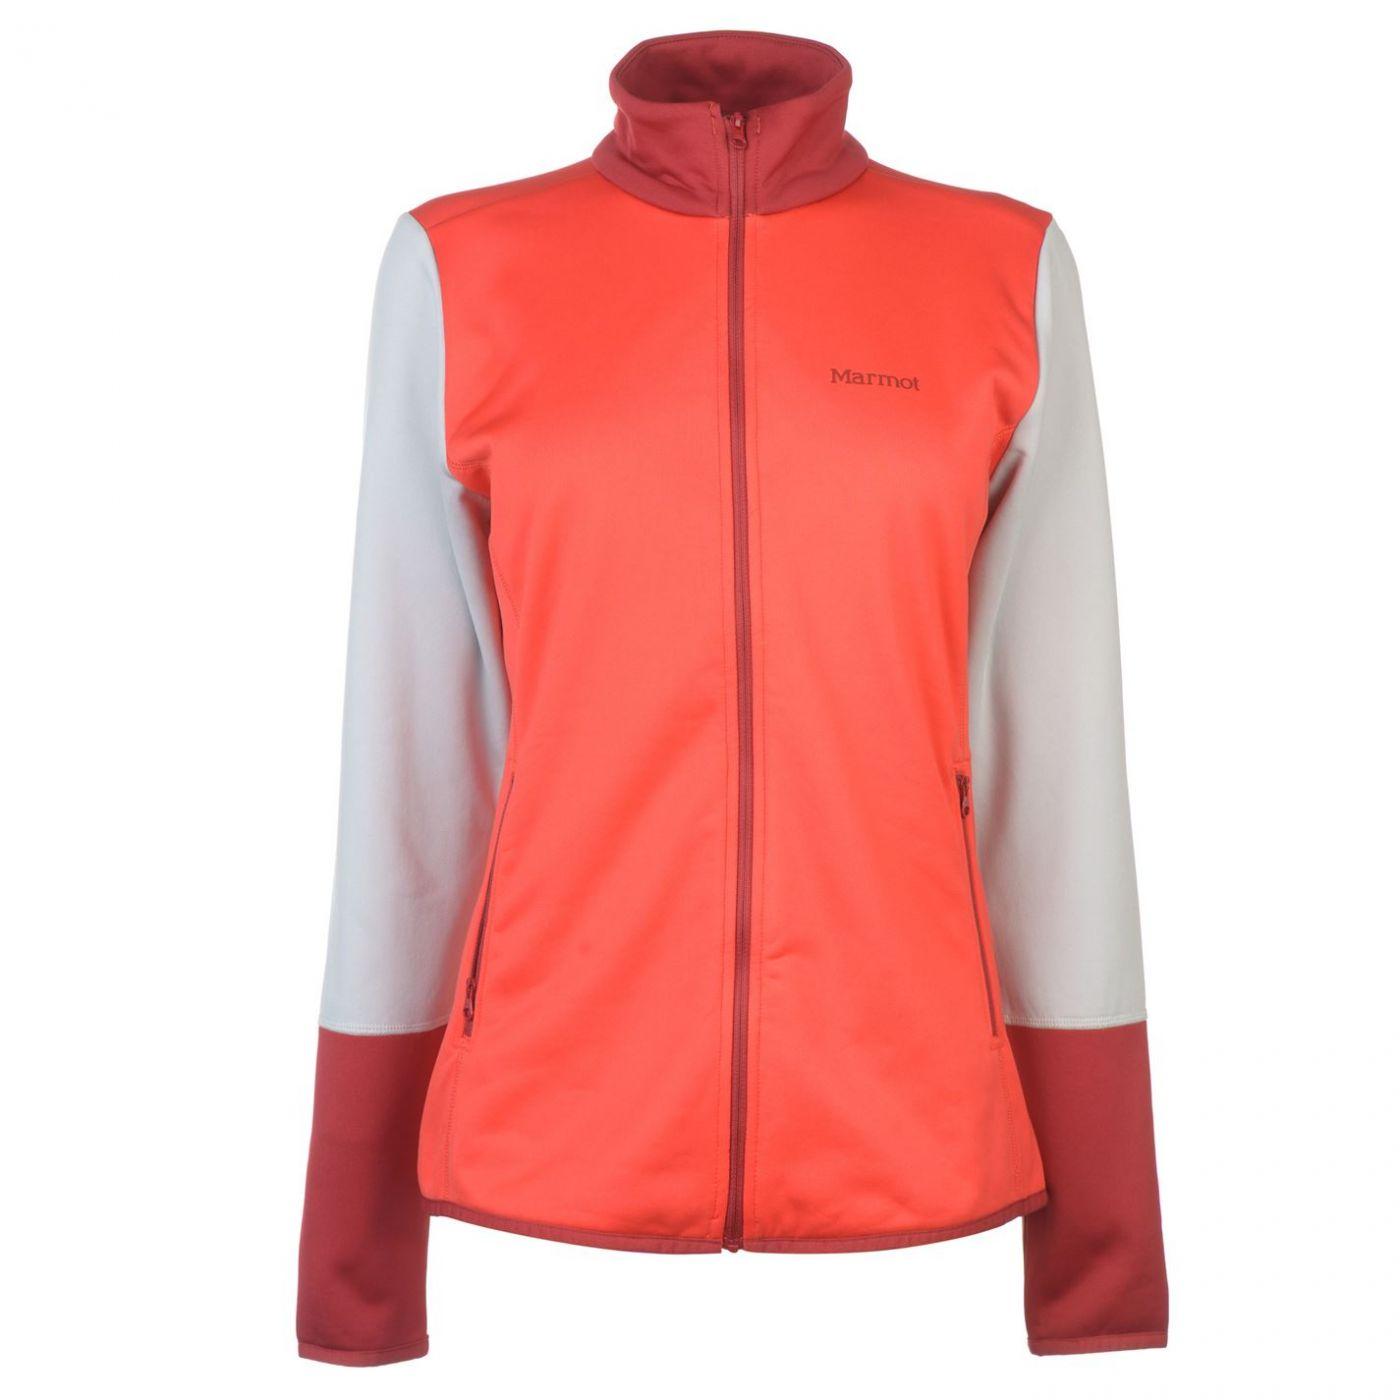 Marmot Thirona Full Zip Jacket Ladies